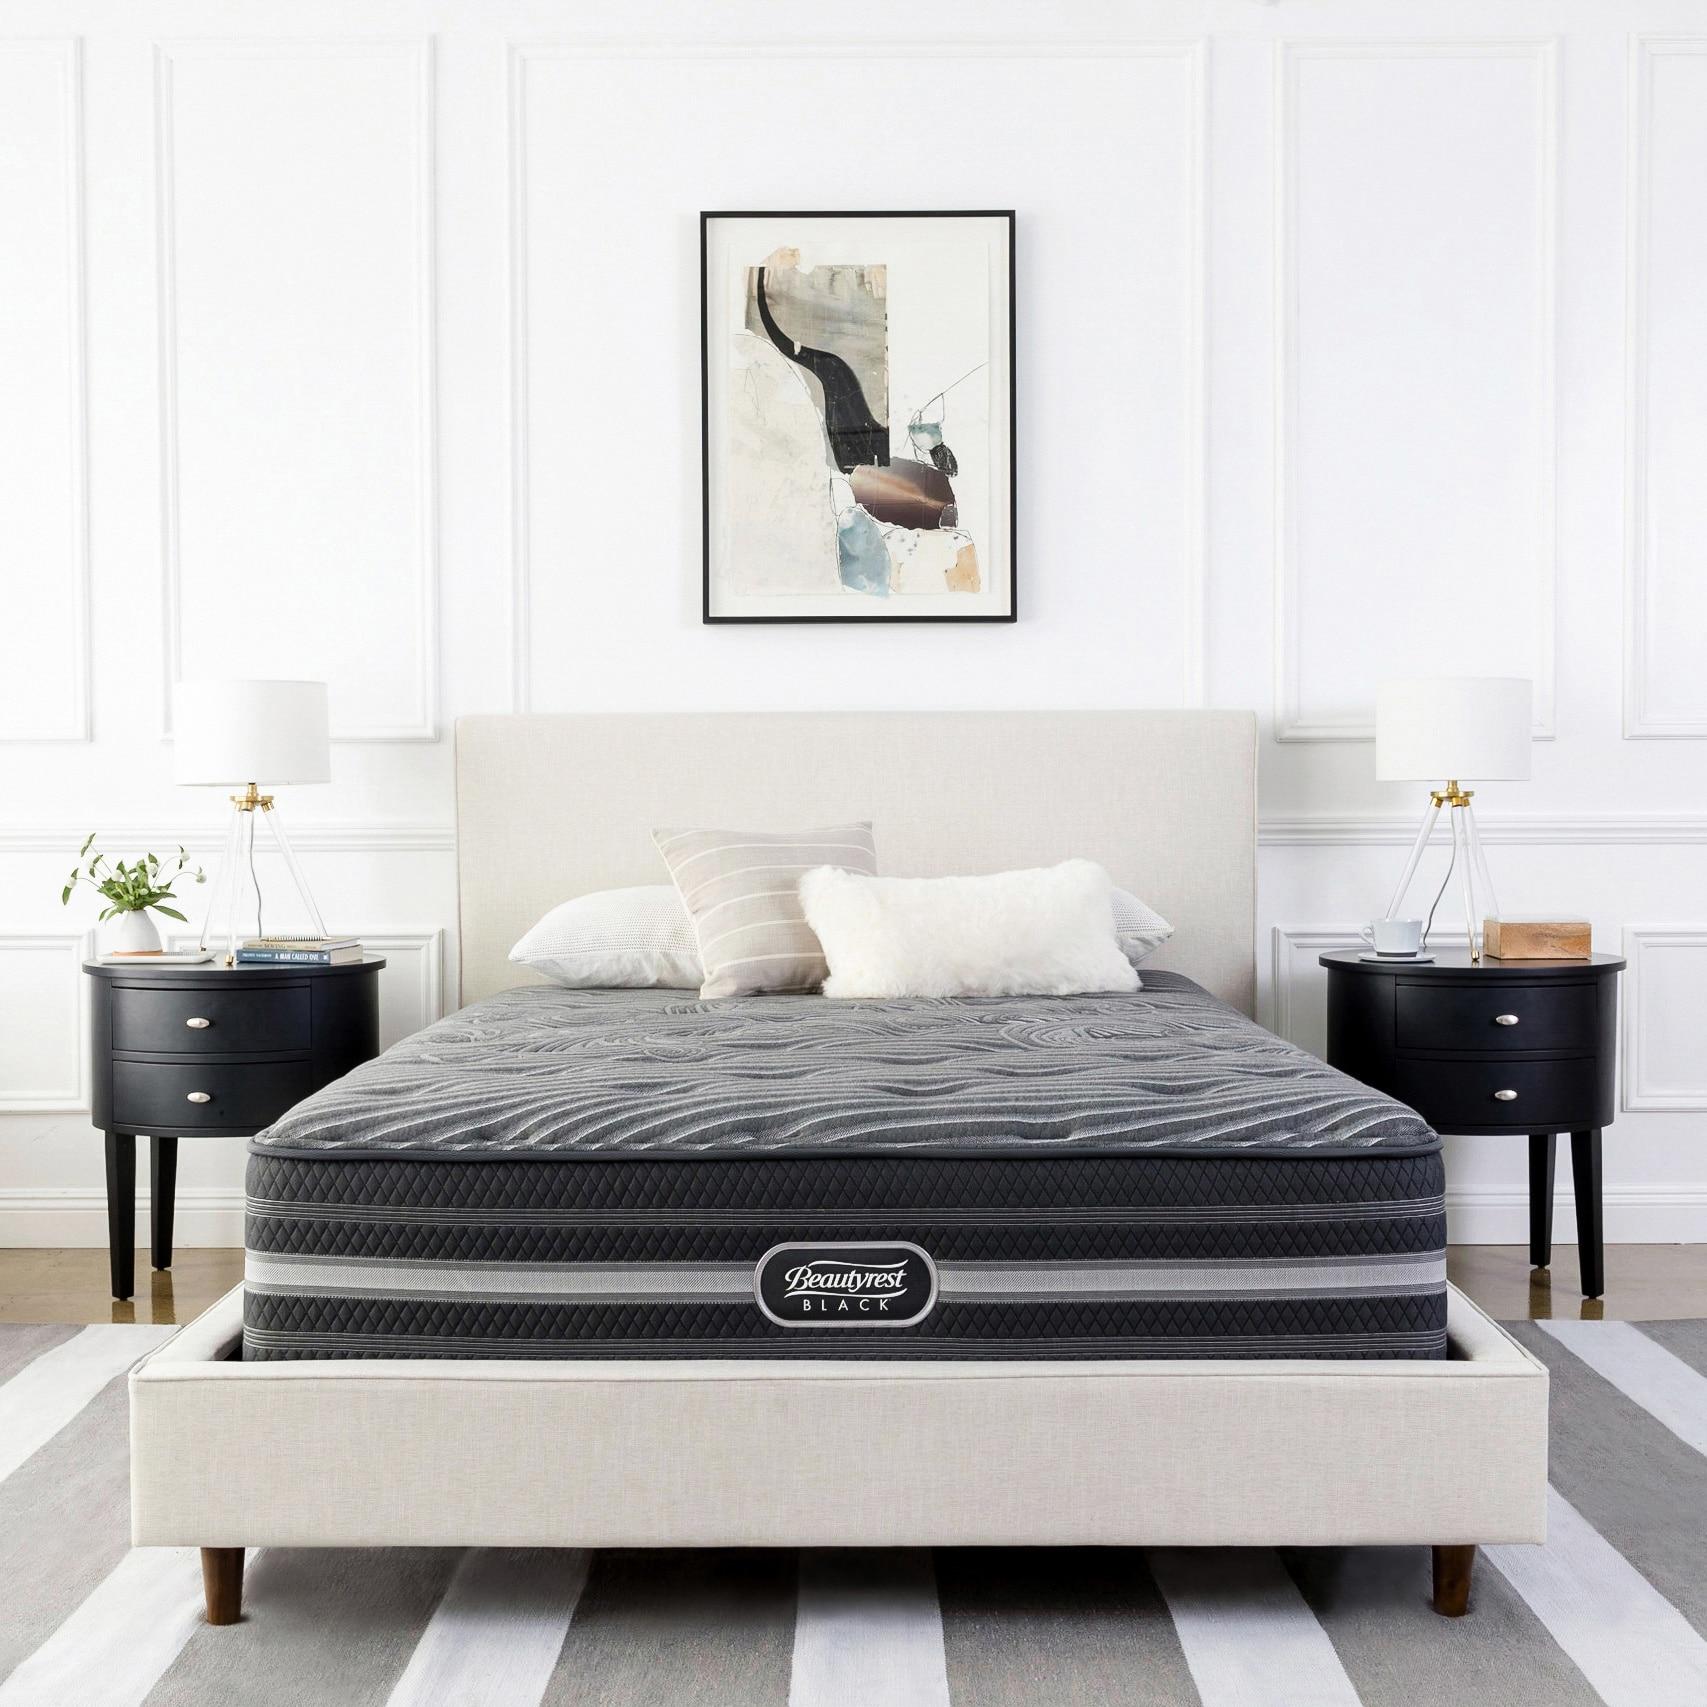 Beautyrest Black Mariela 15-inch Medium Firm California K...